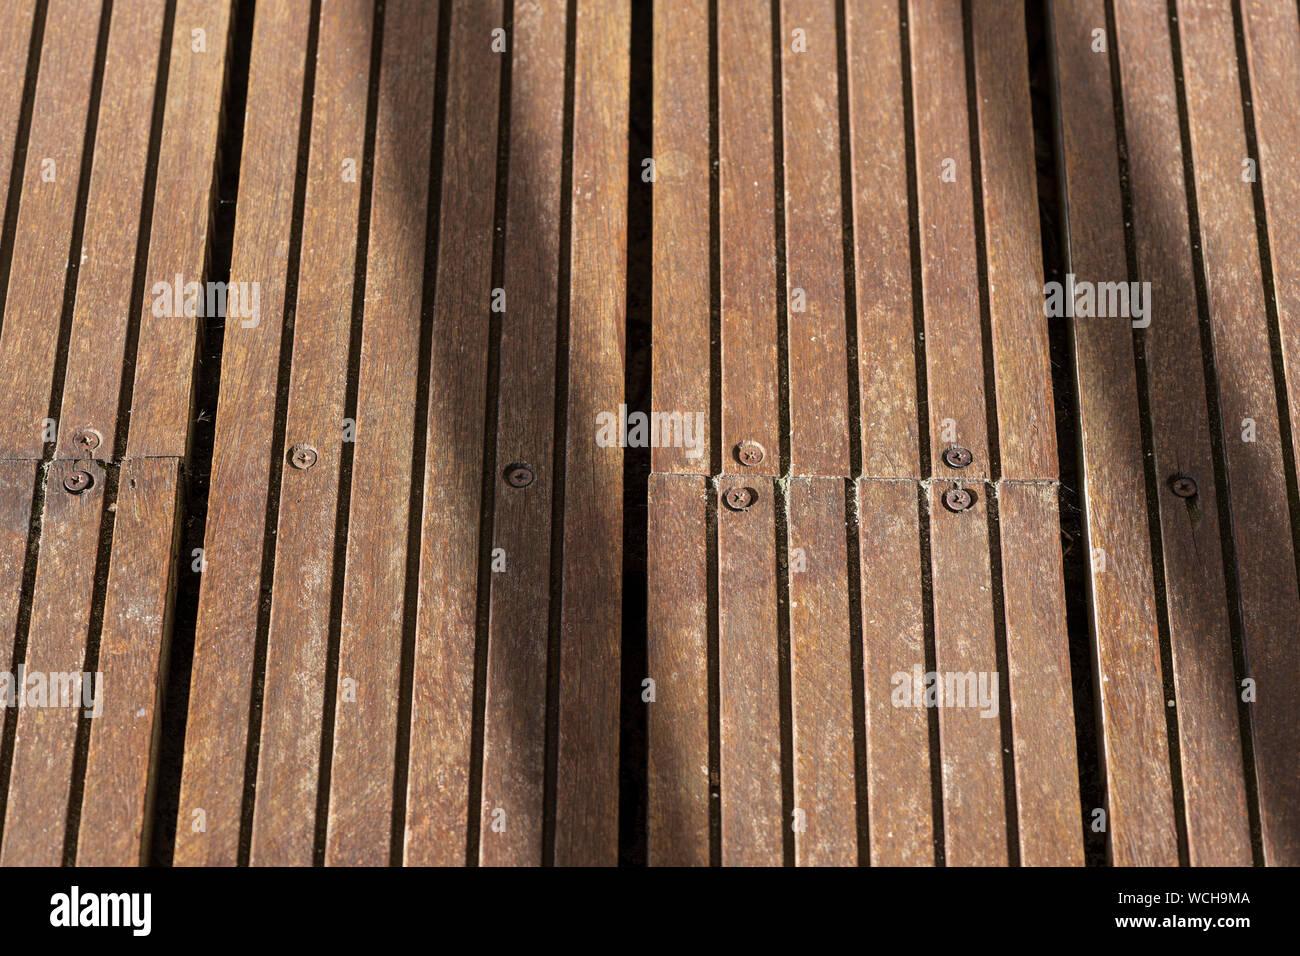 Flooring Screws Stock Photos Flooring Screws Stock Images Alamy